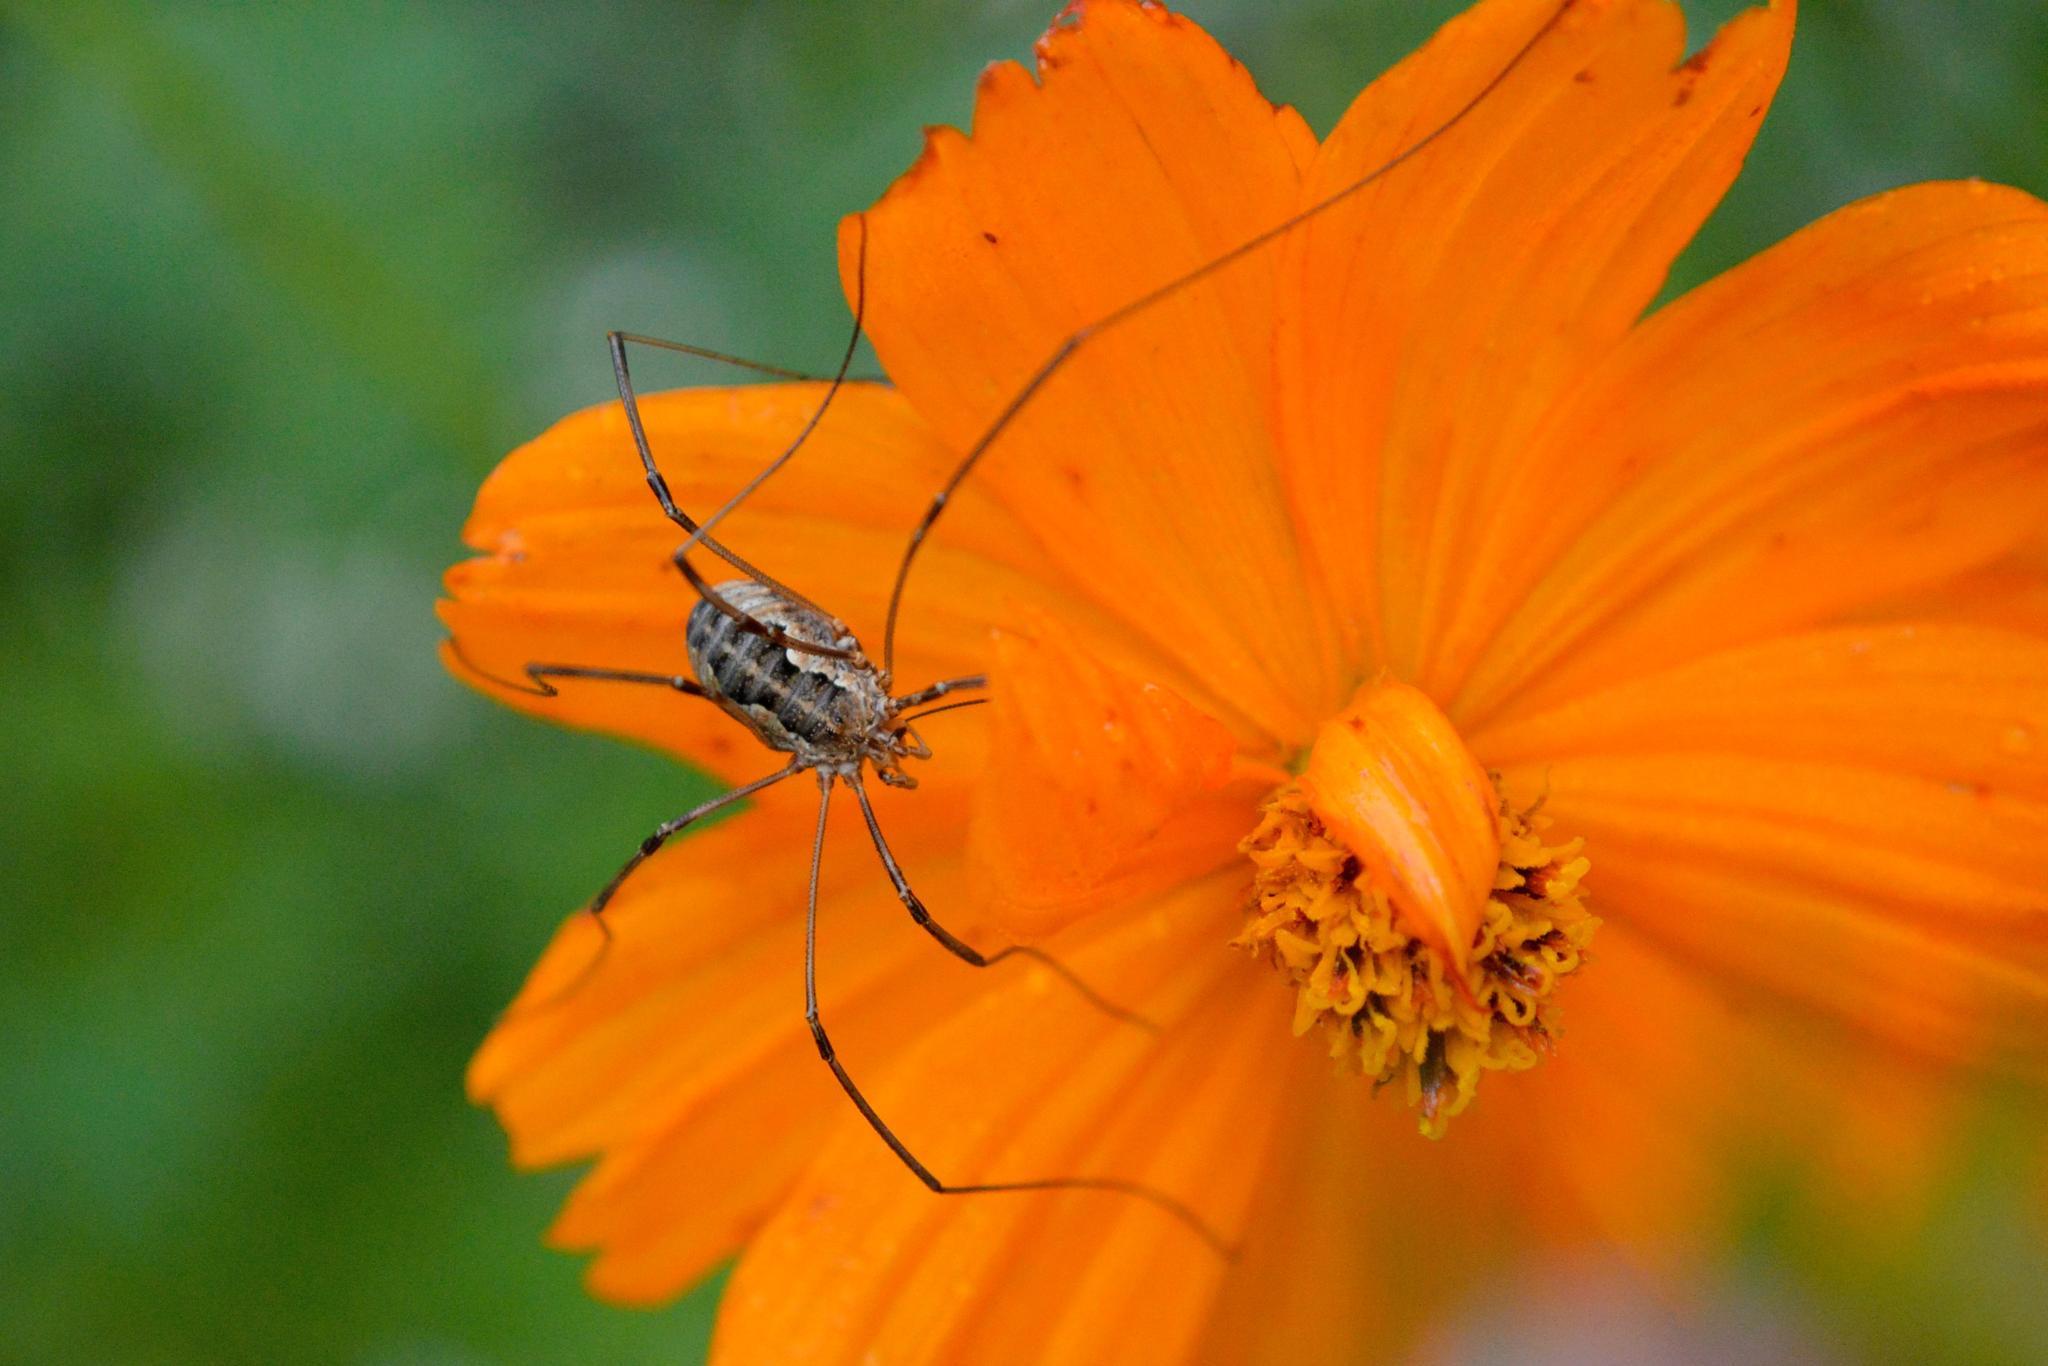 Spider by Michelle Farmer